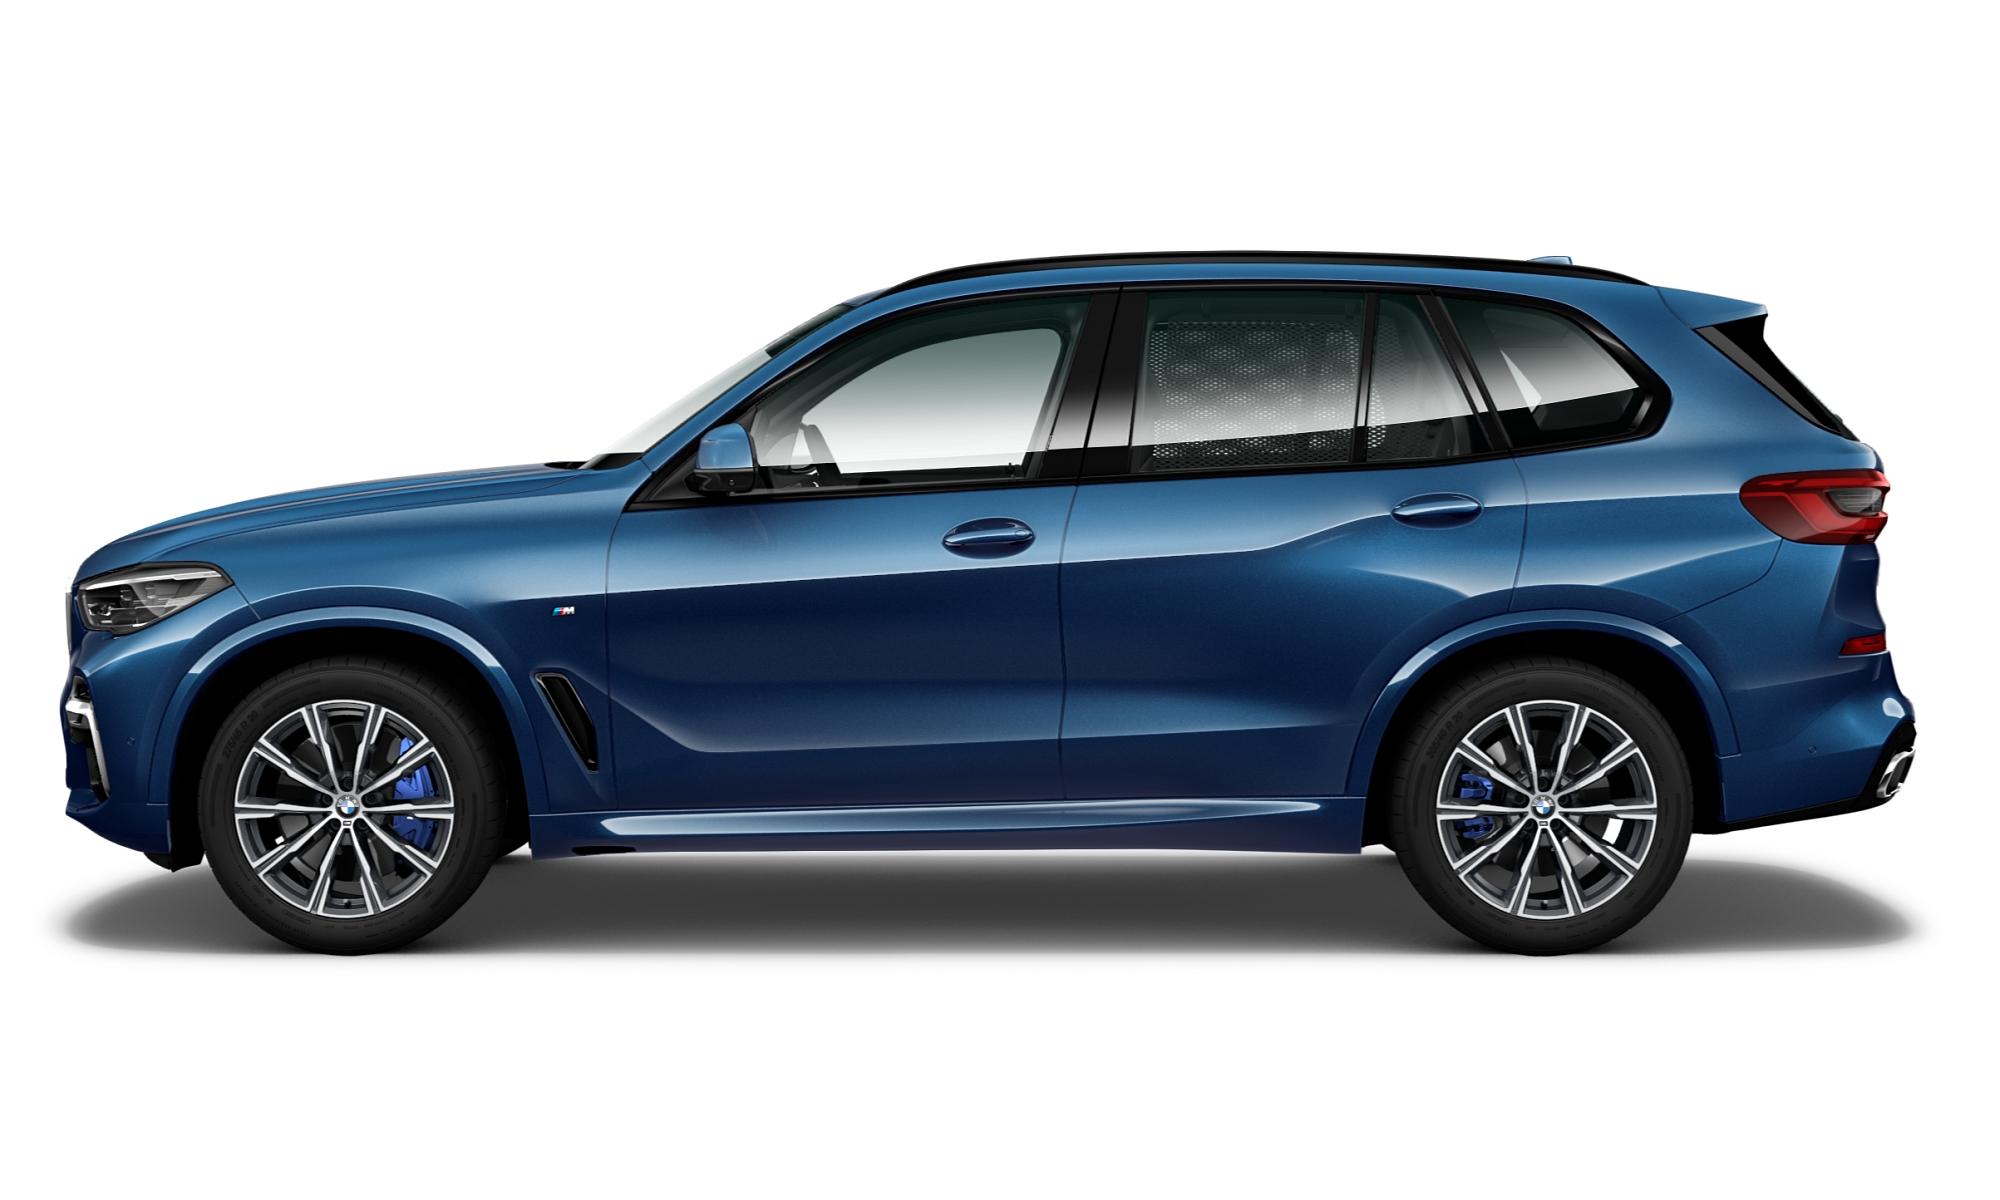 BMW X5 autoliising | Sixt Leasing